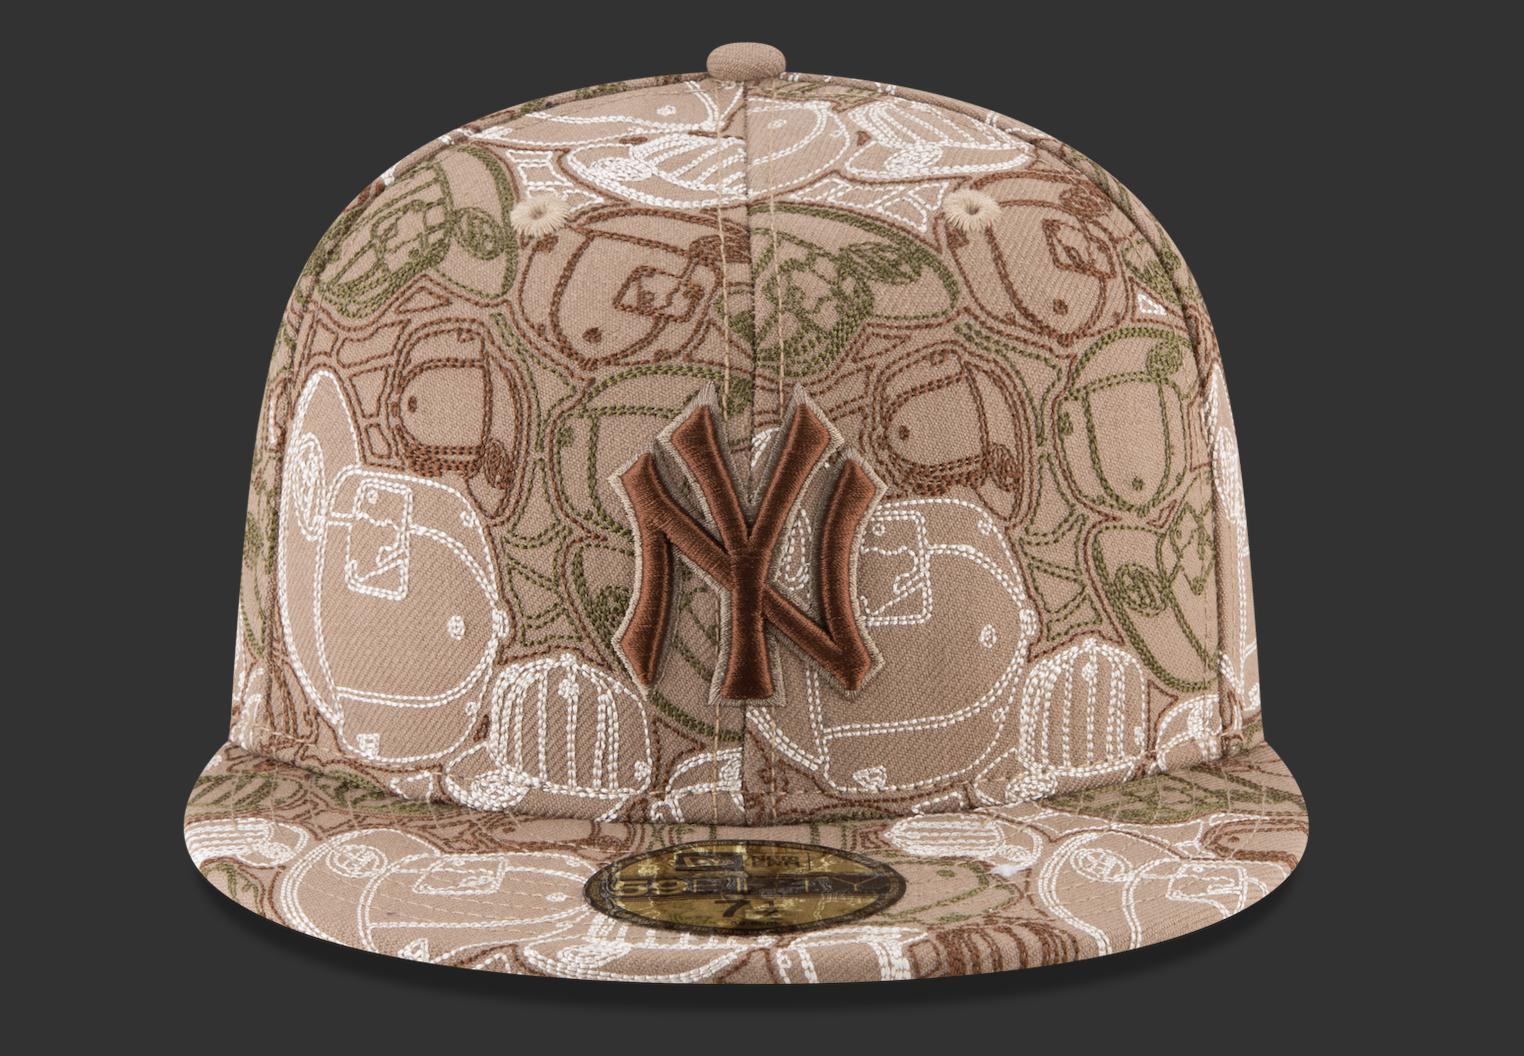 new era s mlb baseball cap has evolved a lot 100